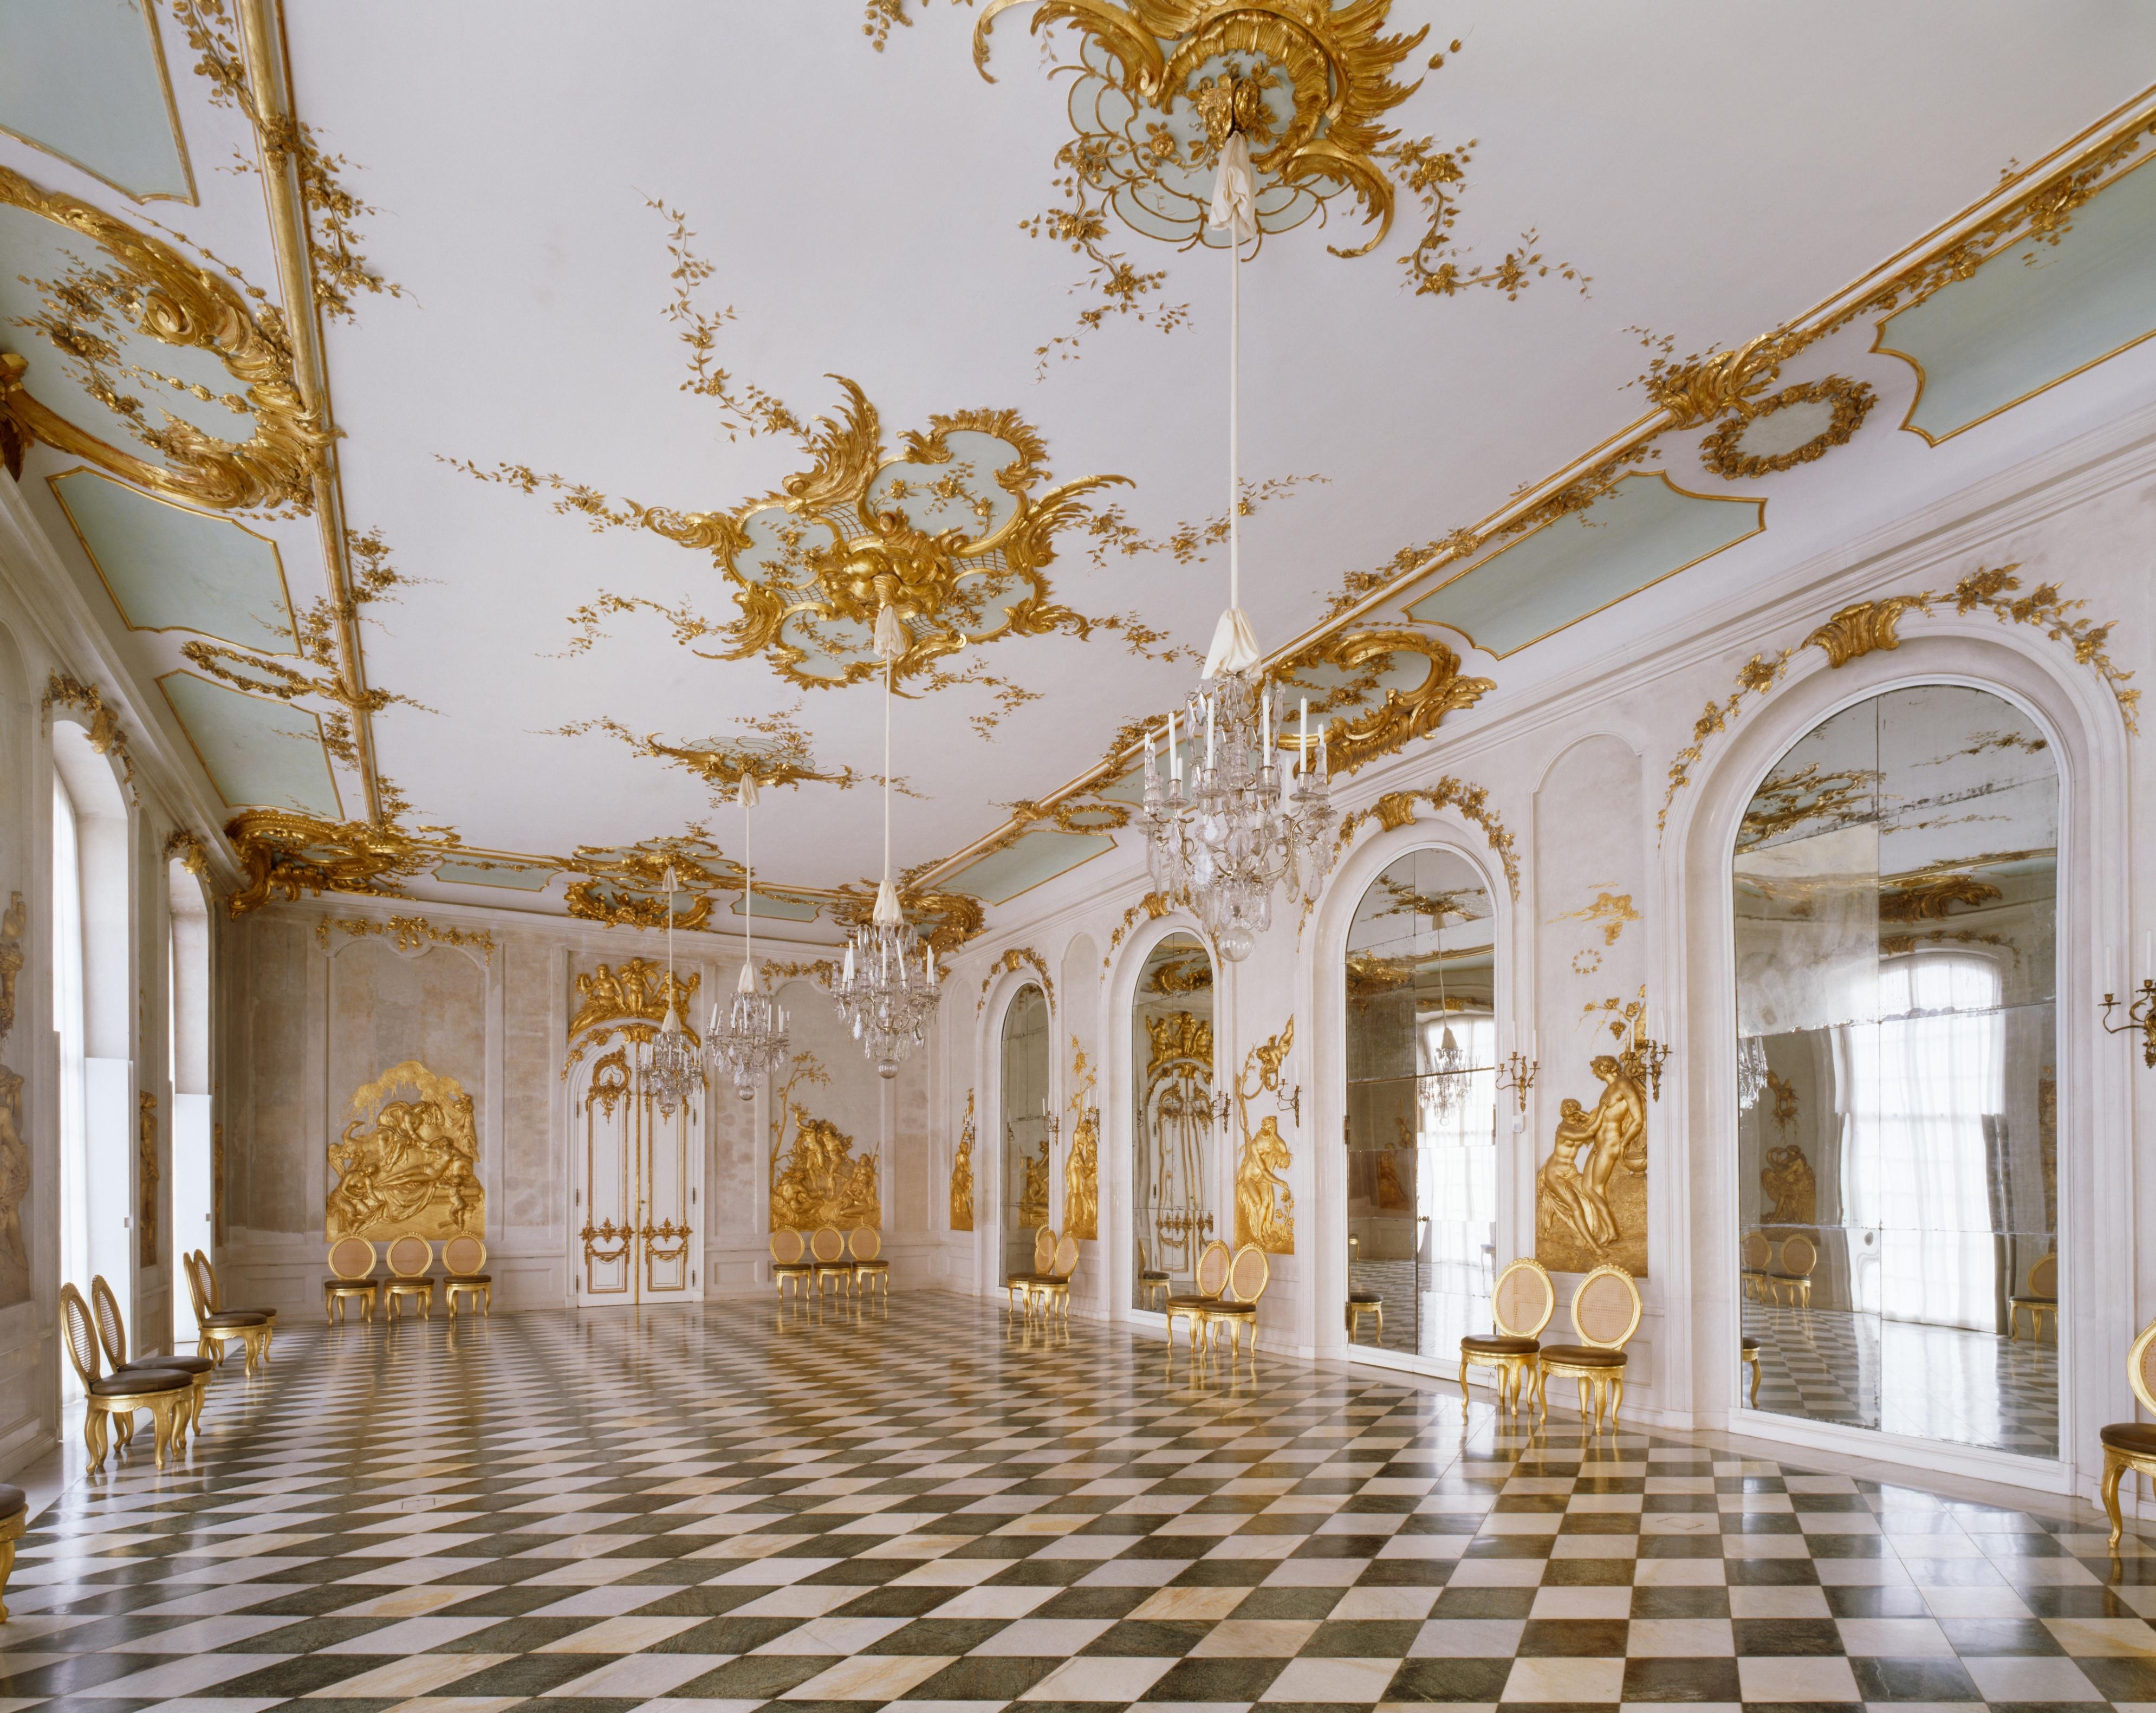 Kronleuchter Behang ~ Kronleuchter mit behang aus glas 12 kerzen :: stiftung preußische